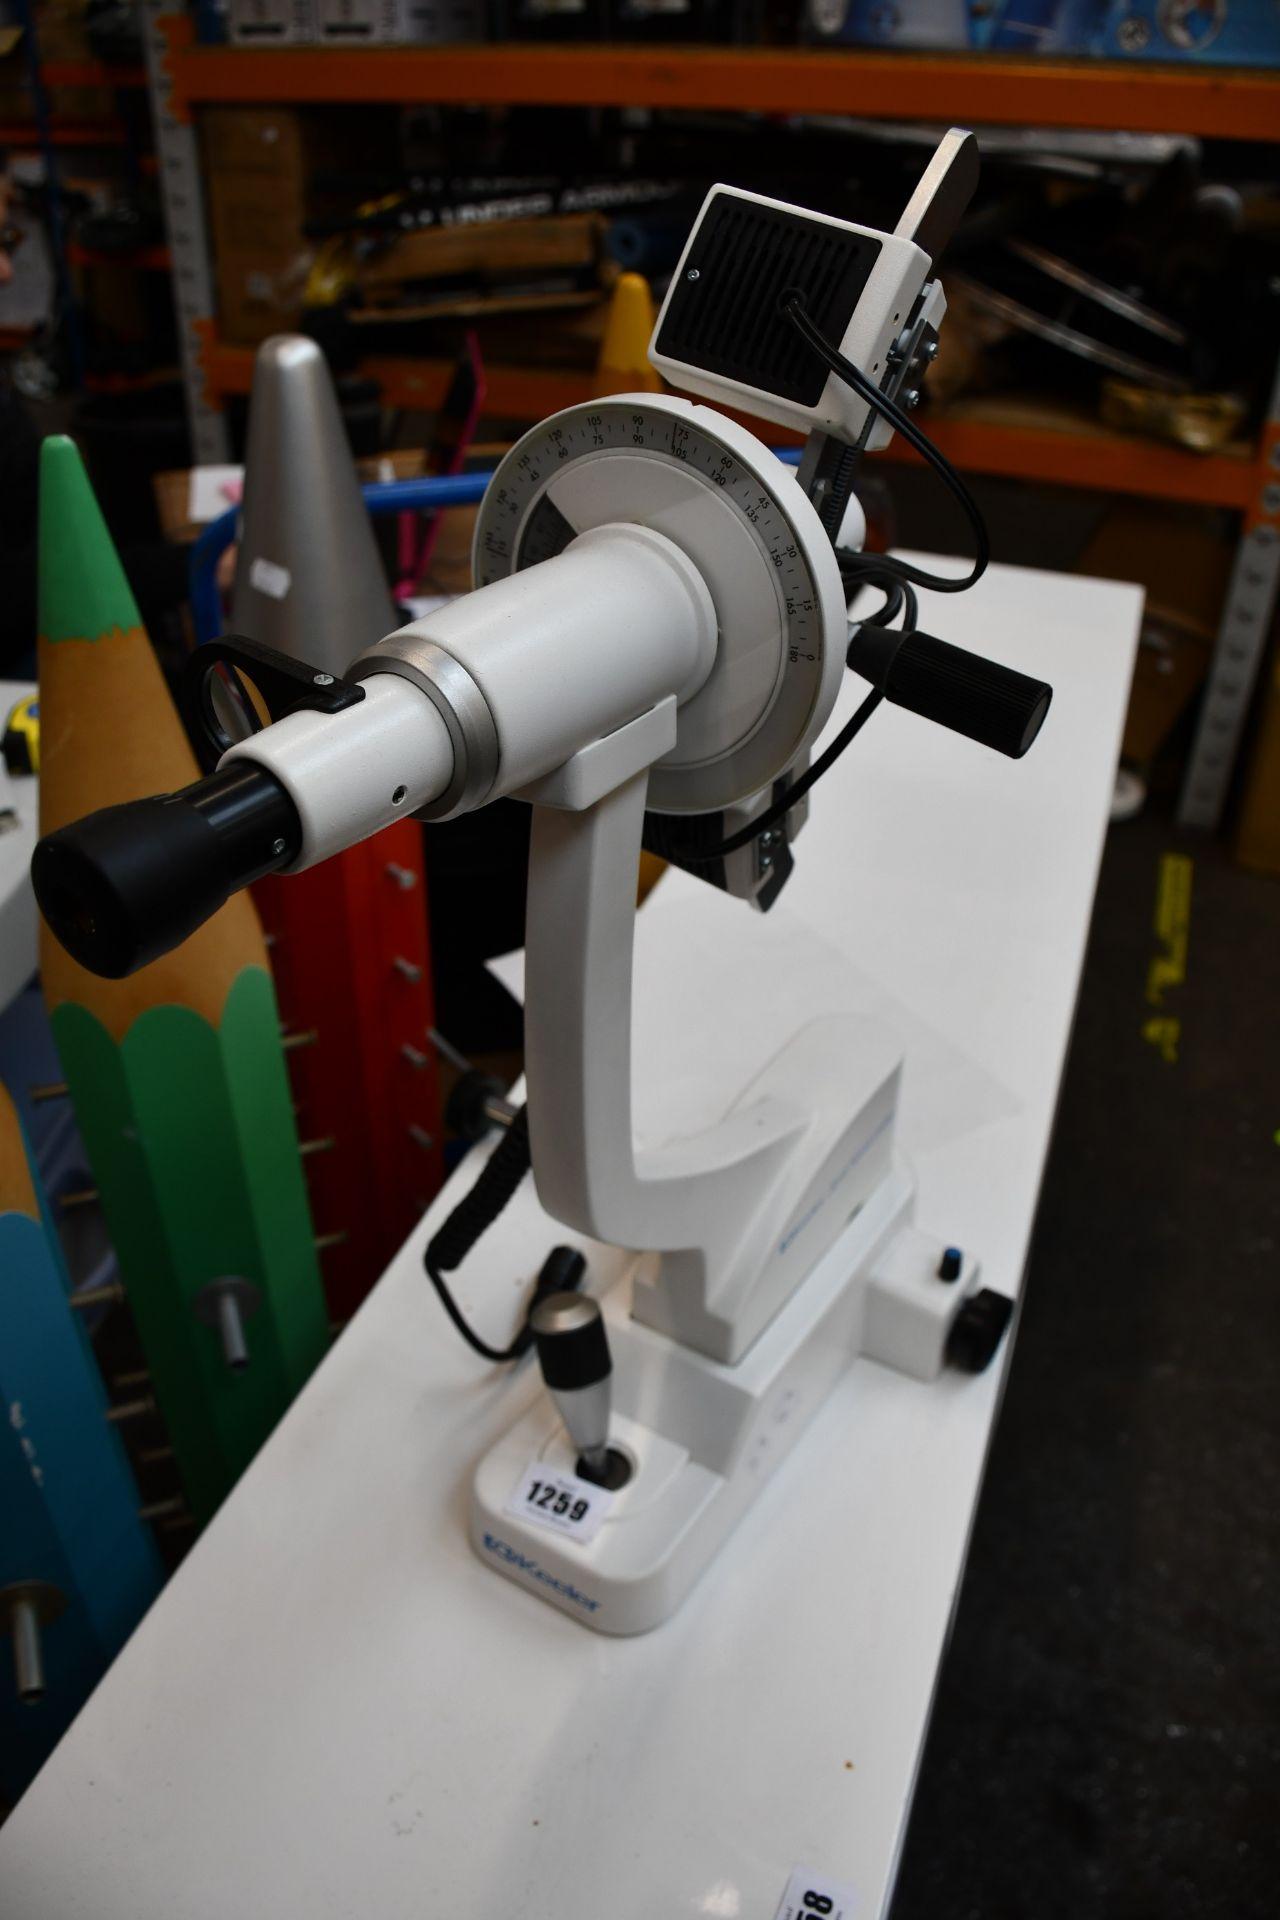 Lot 1259 - A Keeler Javal Keratometer.